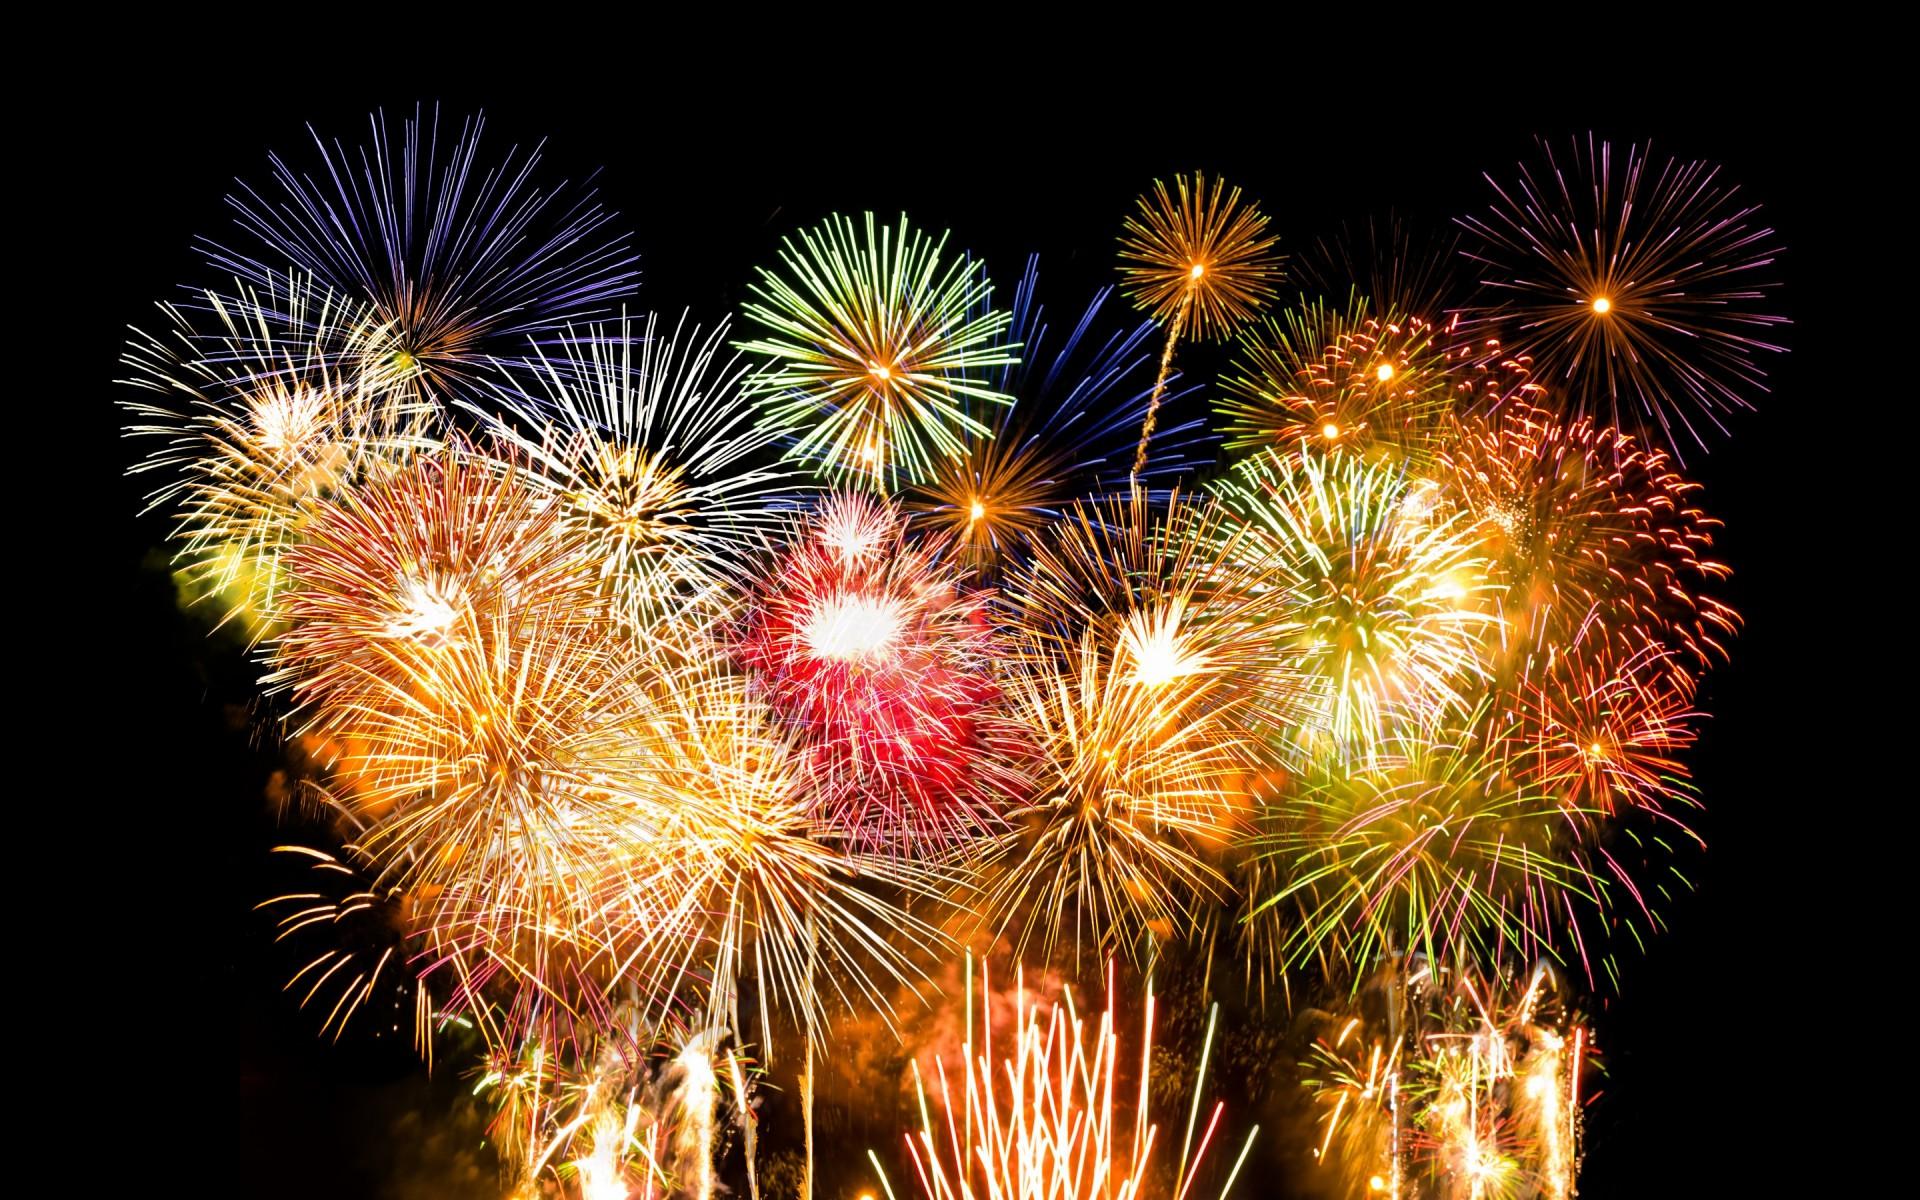 eautiful Fireworks Wallpaper 8649